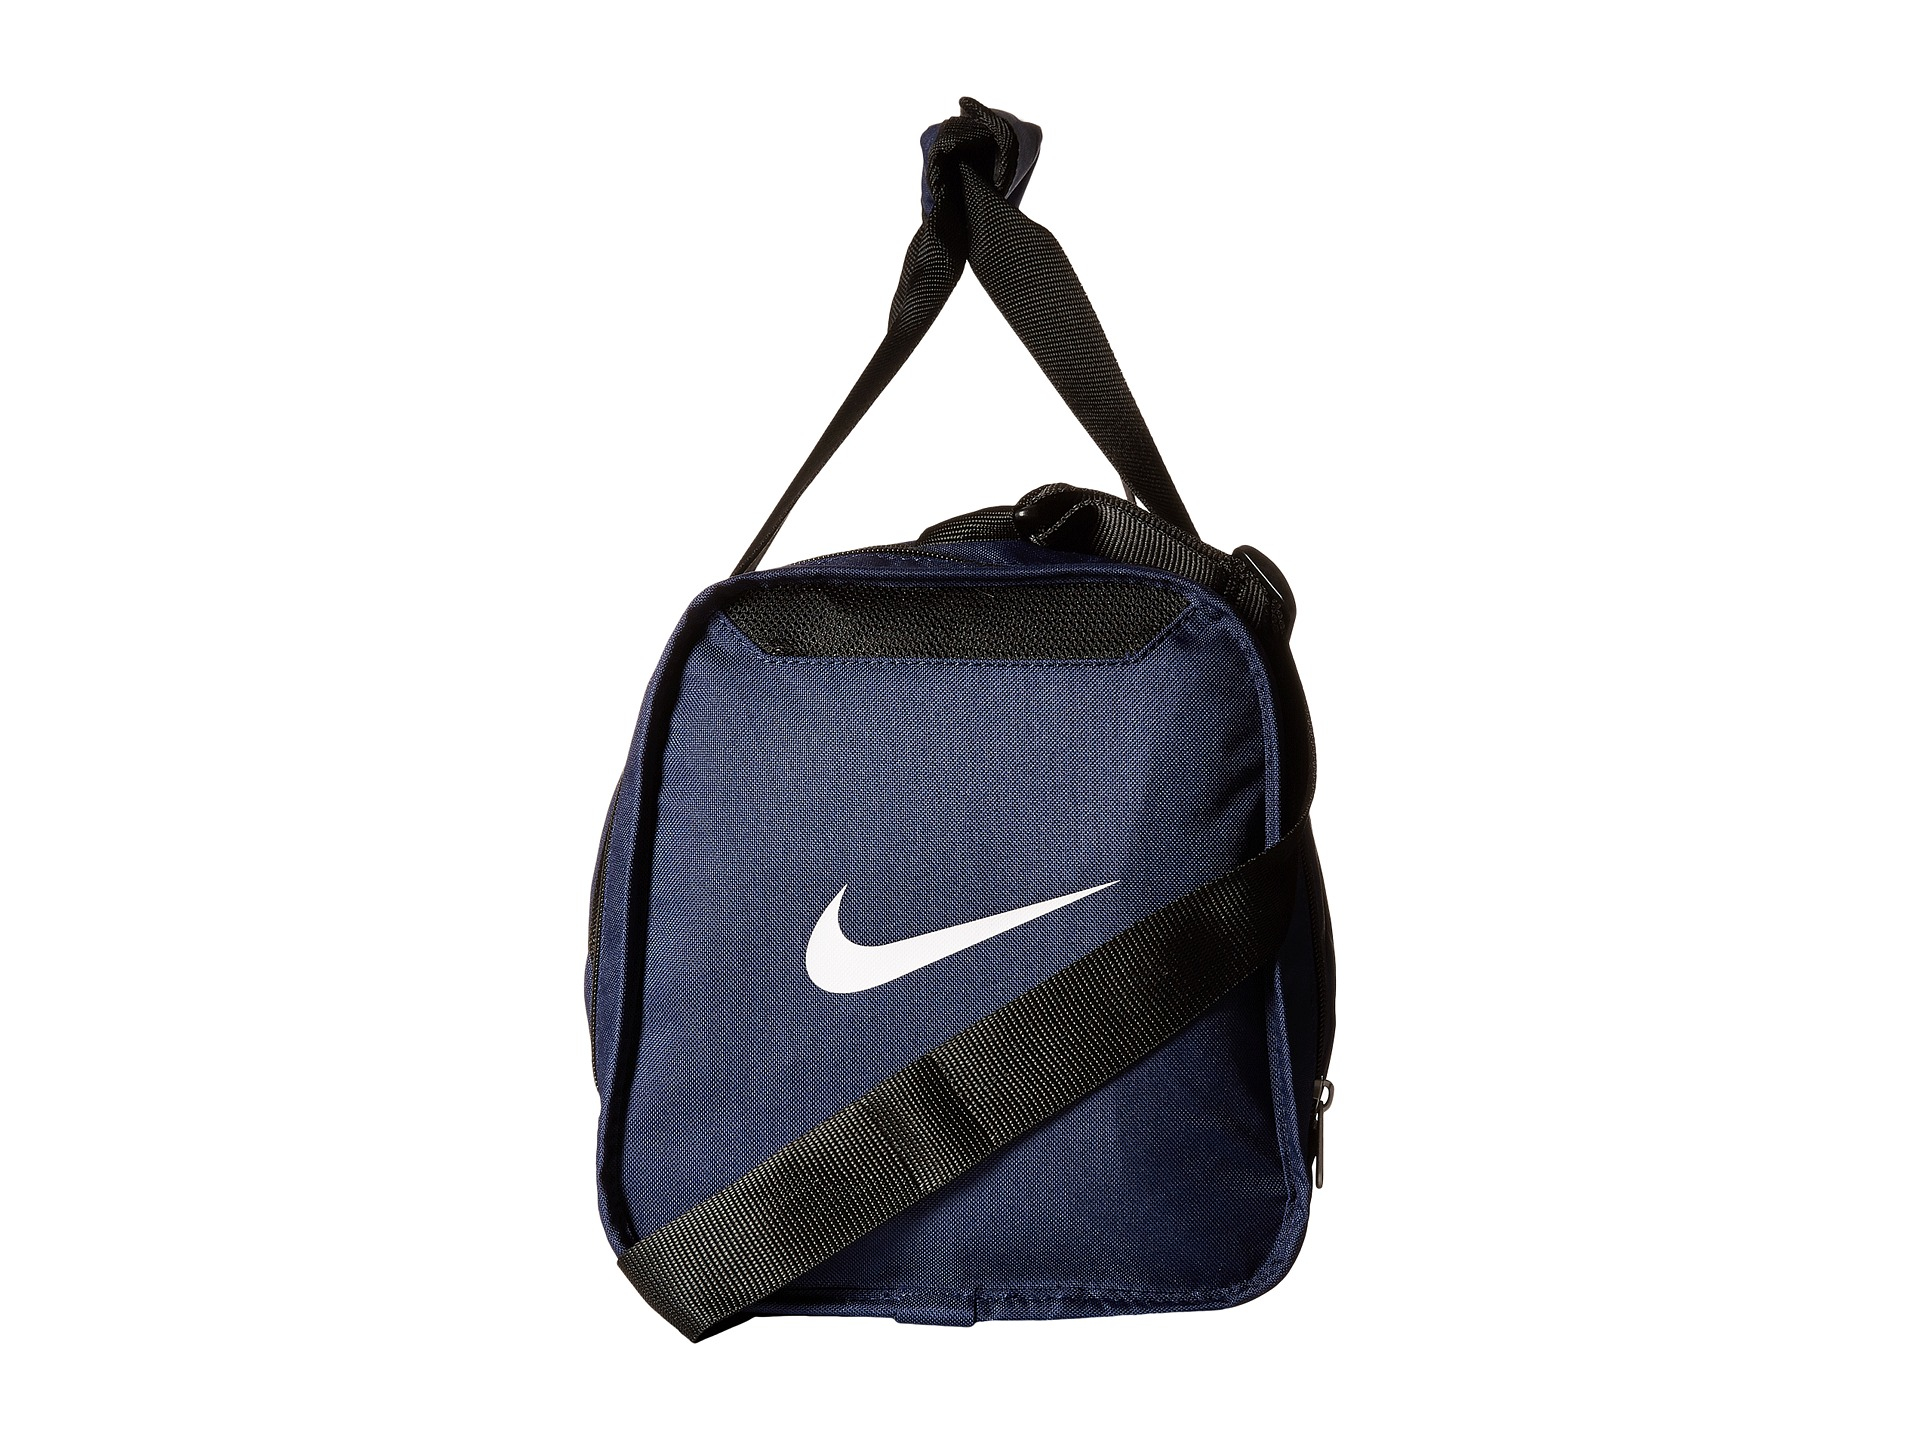 01a801fbf5ba3 Nike Brasilia Extra Small Duffel Bag Sporttasche